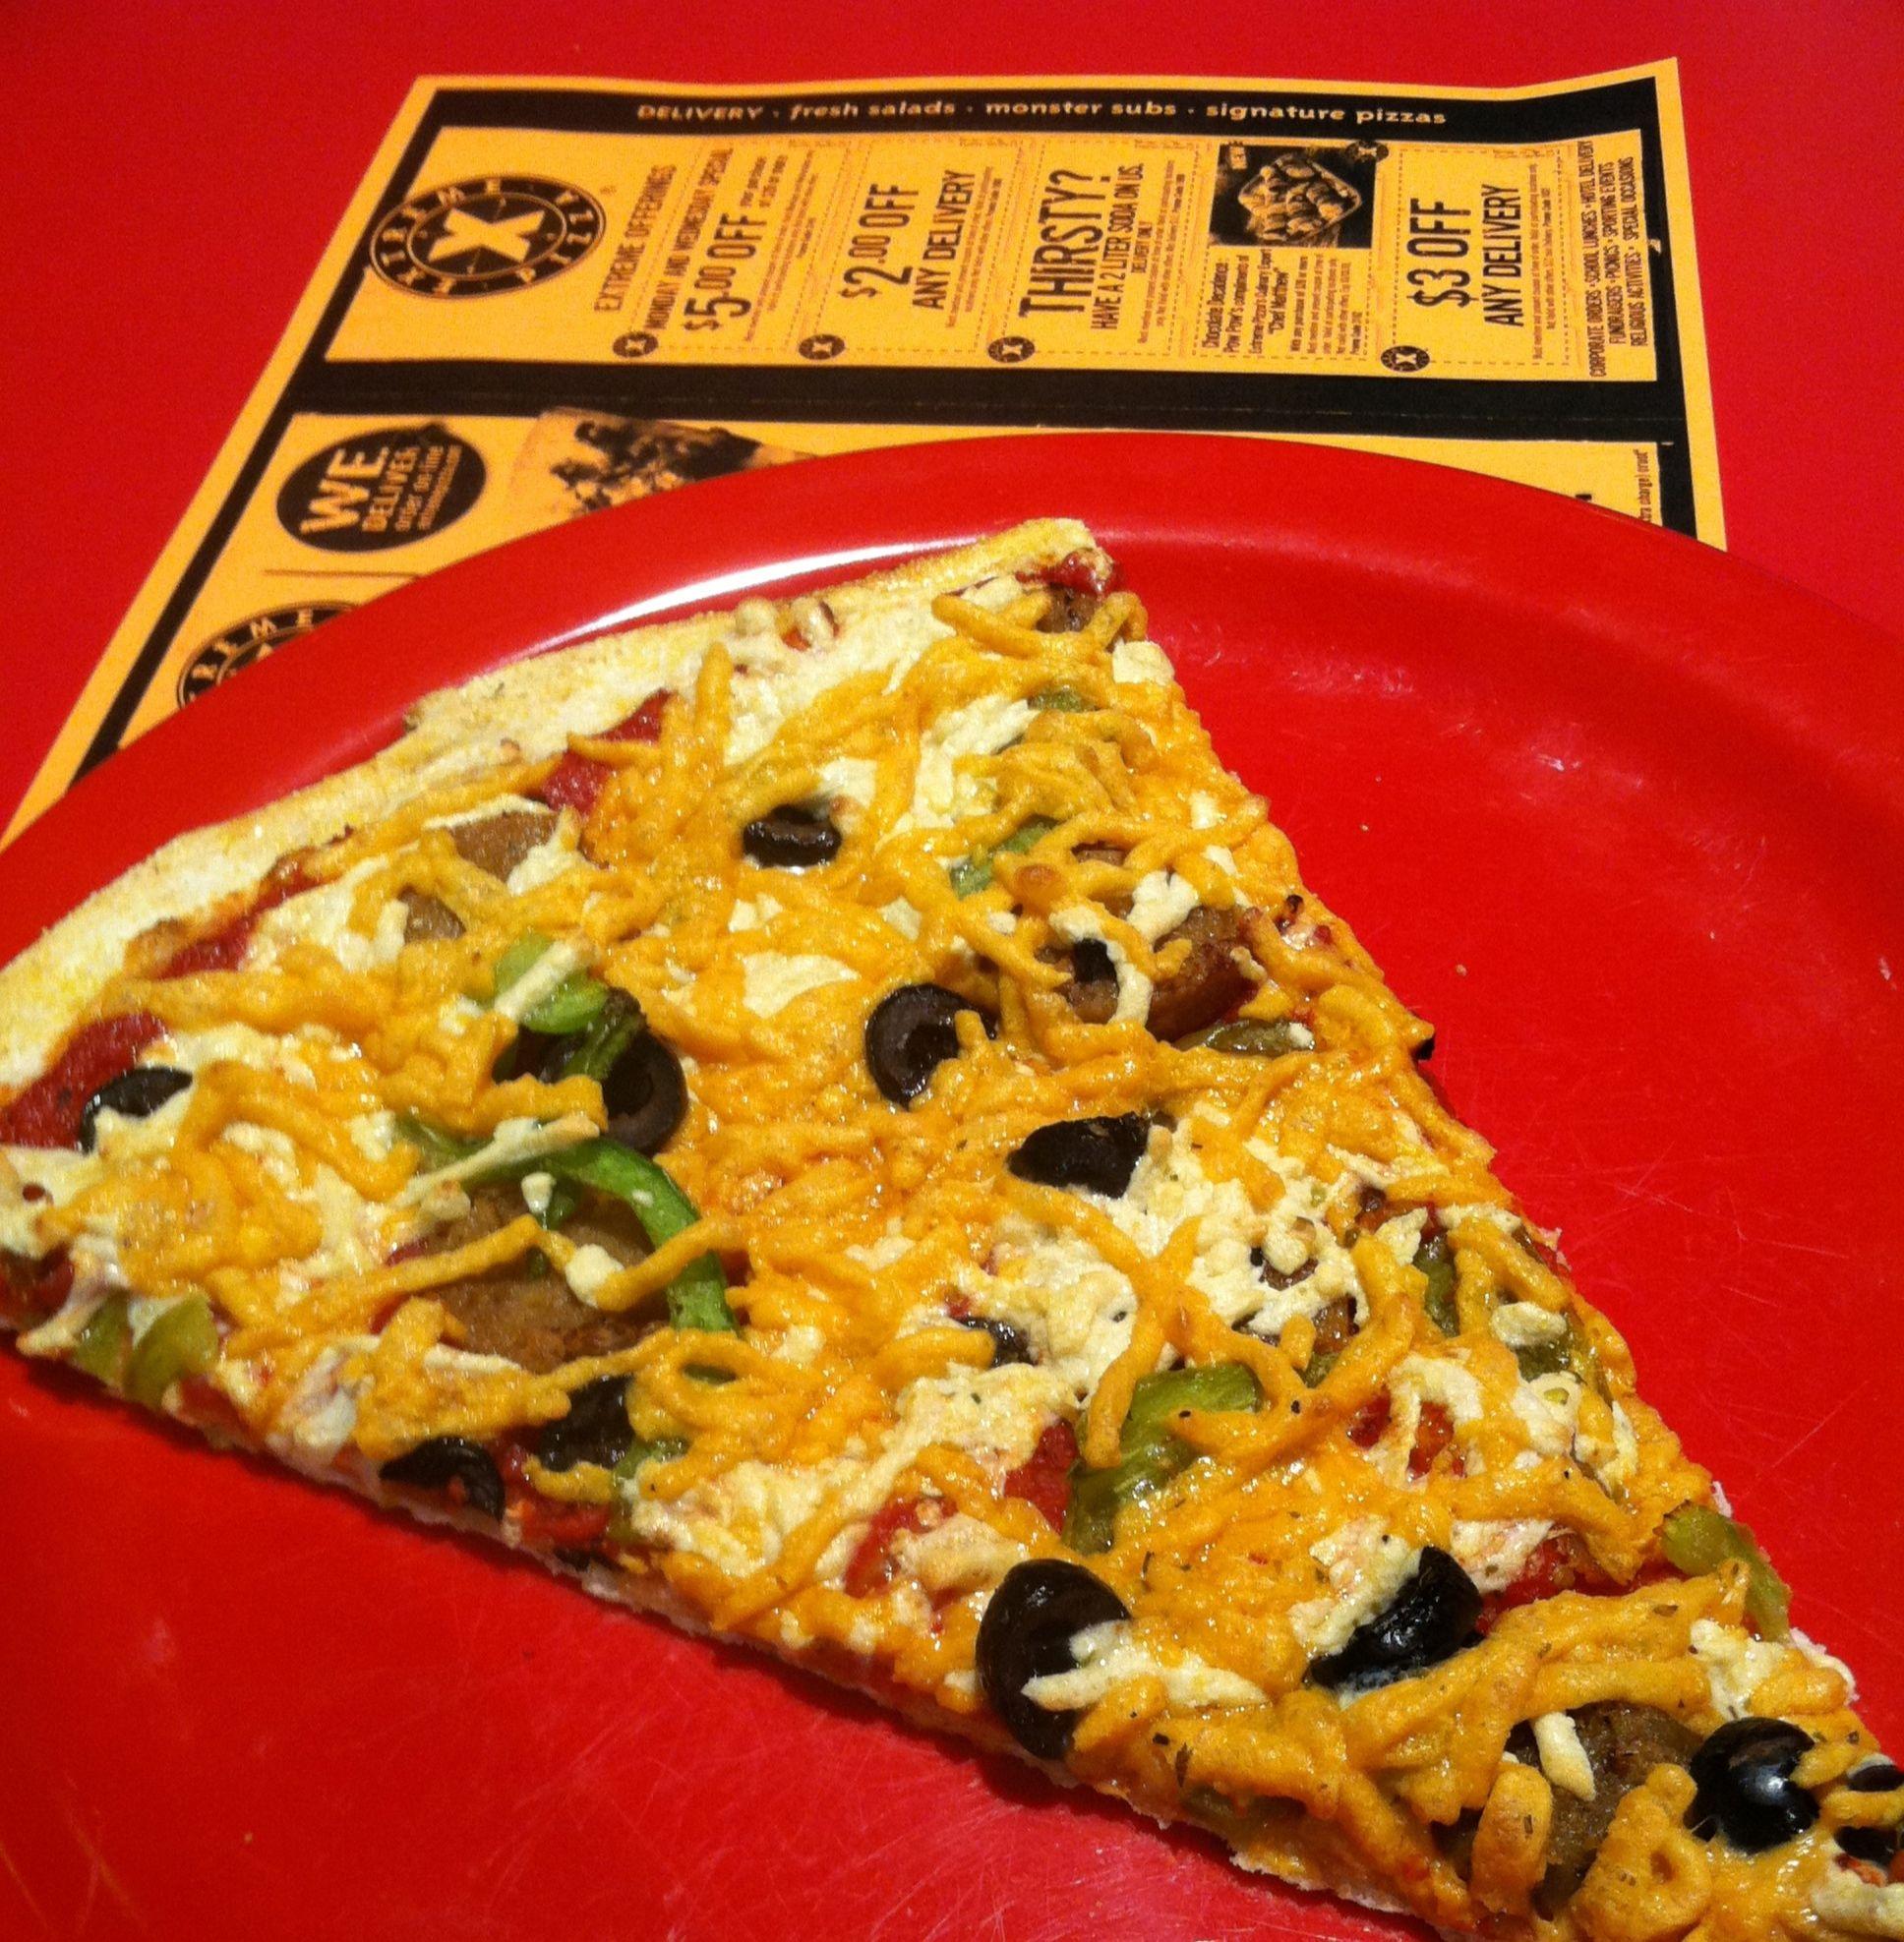 Extreme Pizza Omaha Daiya Cheese With Field Roast Grain